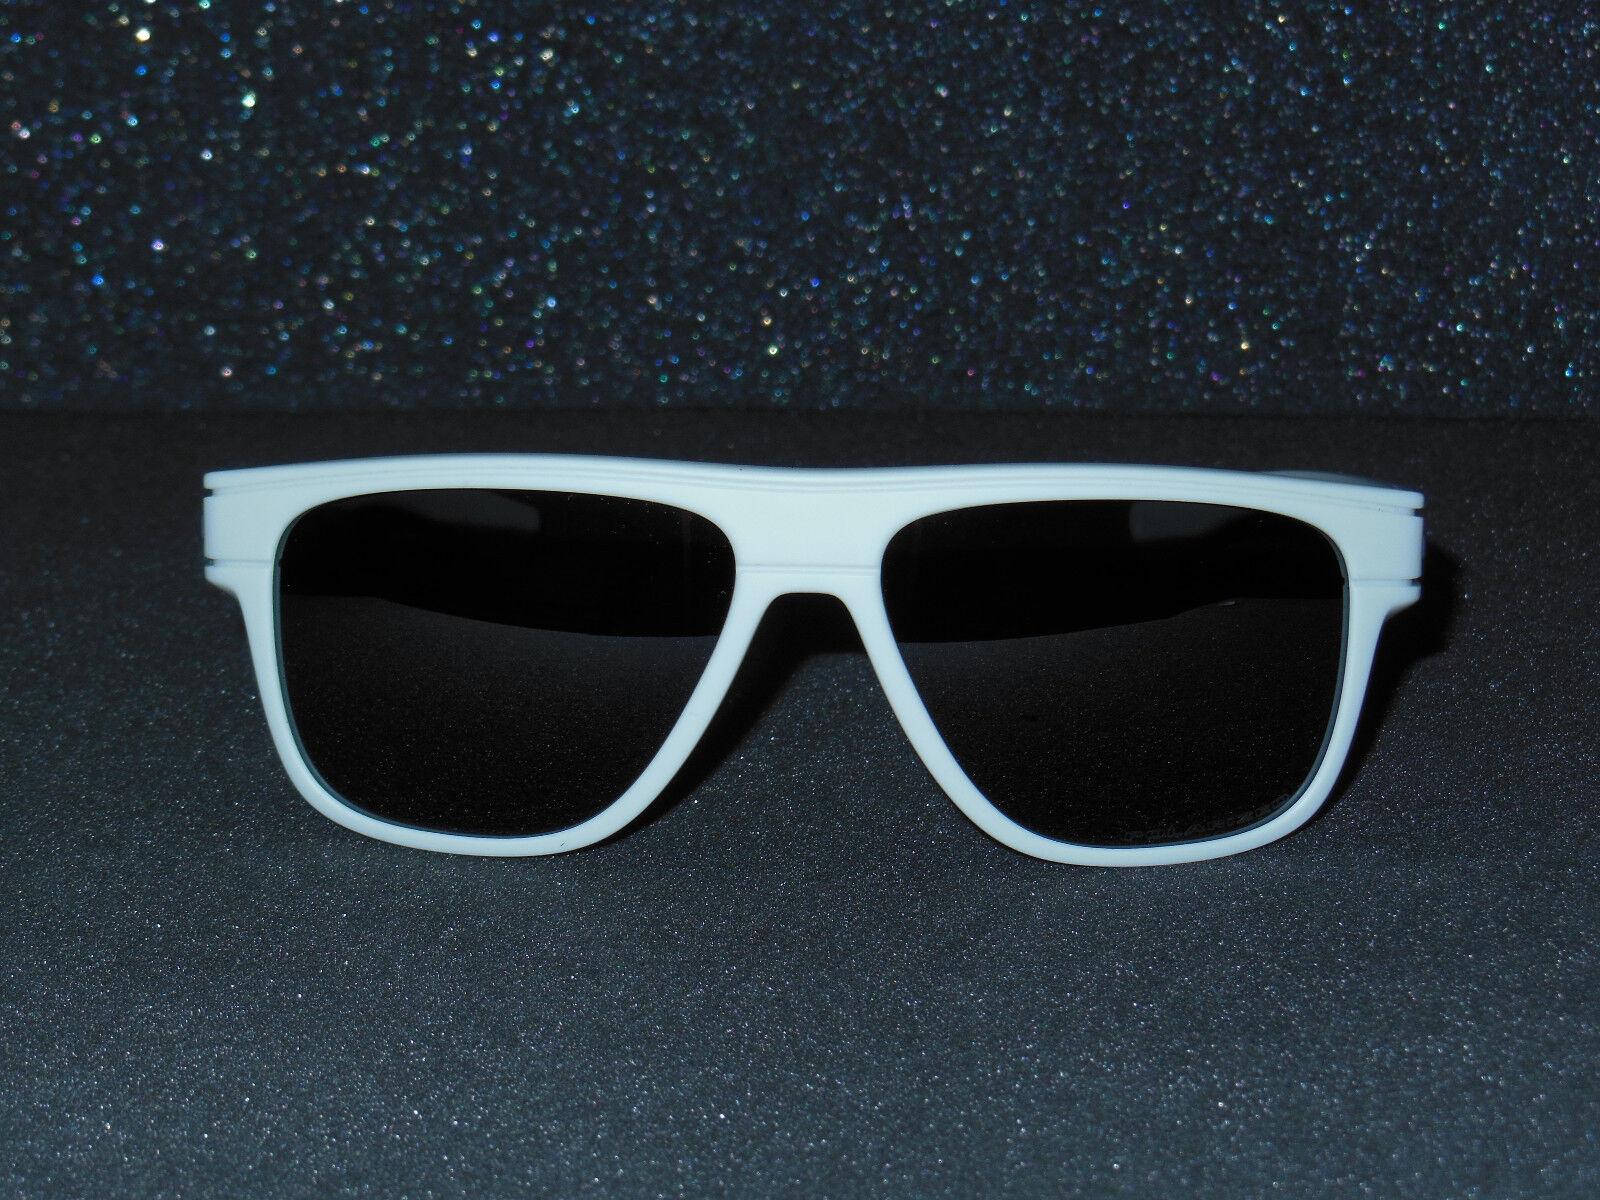 5654fb3694 Oakley Breadbox Black Iridium Polarized Men s Sunglasses Oak Item No. Oo9199  919927 56 for sale online